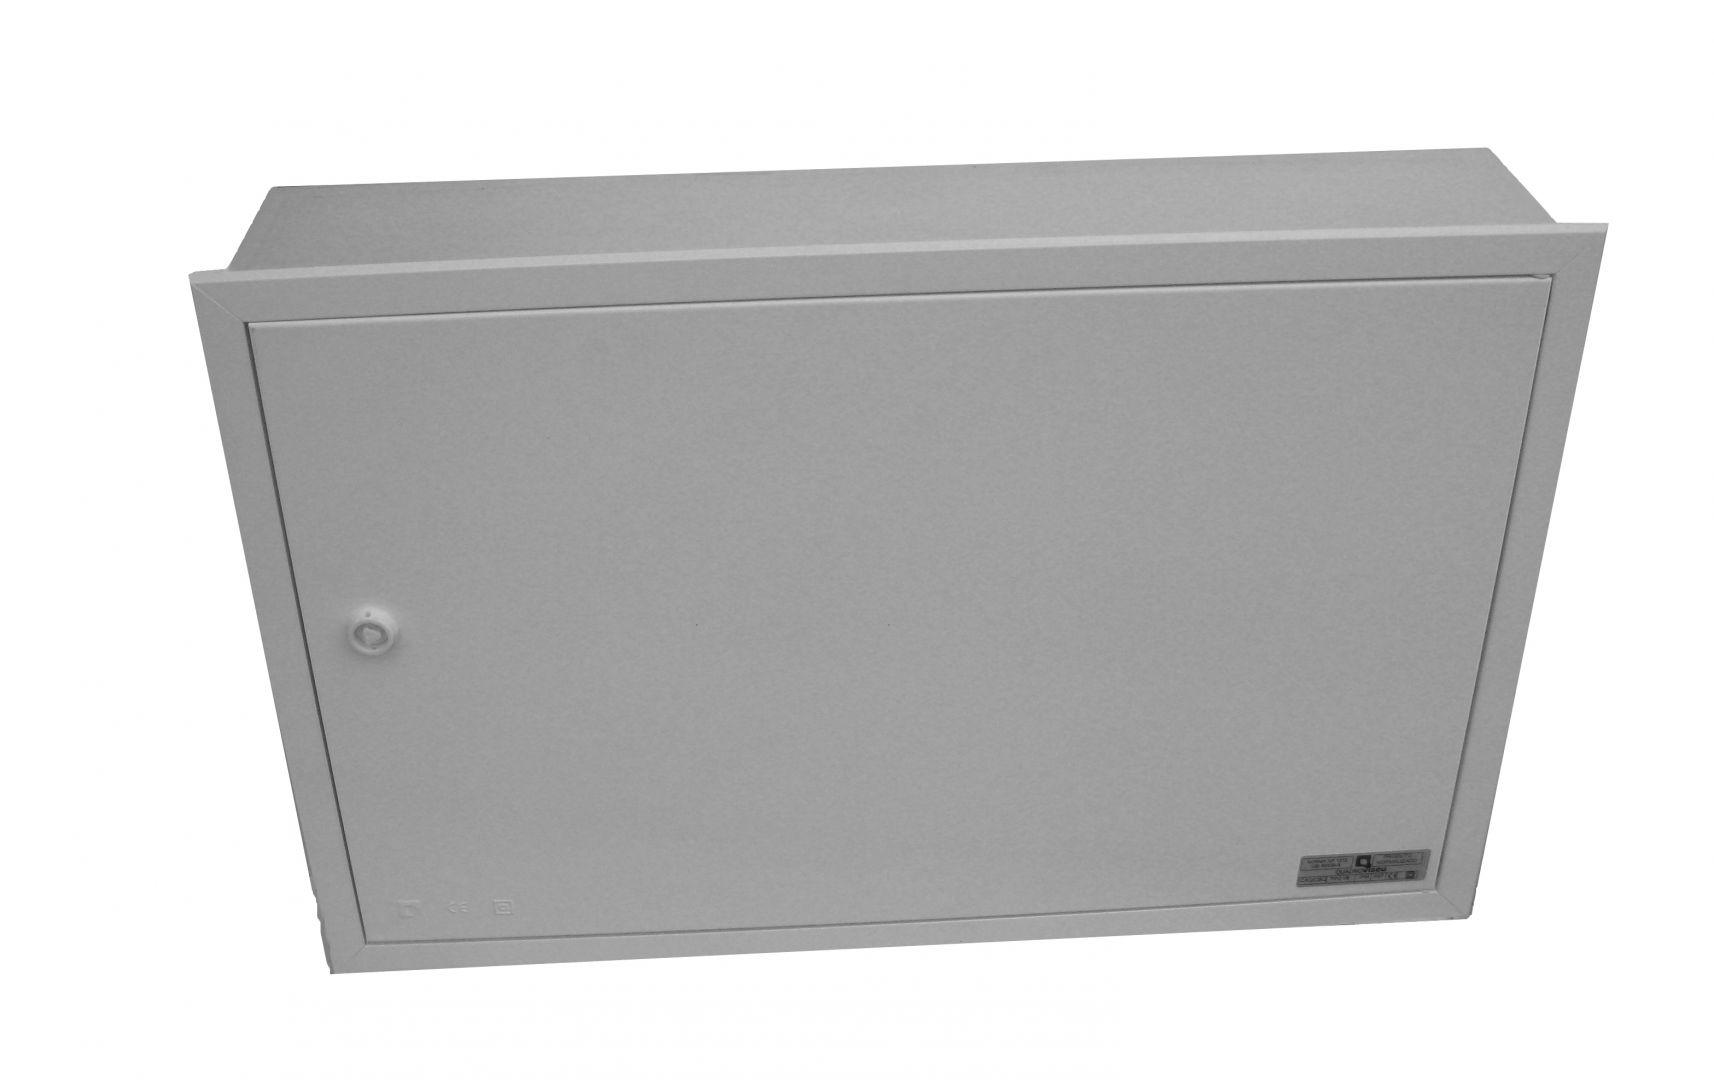 ENVELOPE VISBOX VIDE A ENCASTRER AVEC PORTE 500X250X130